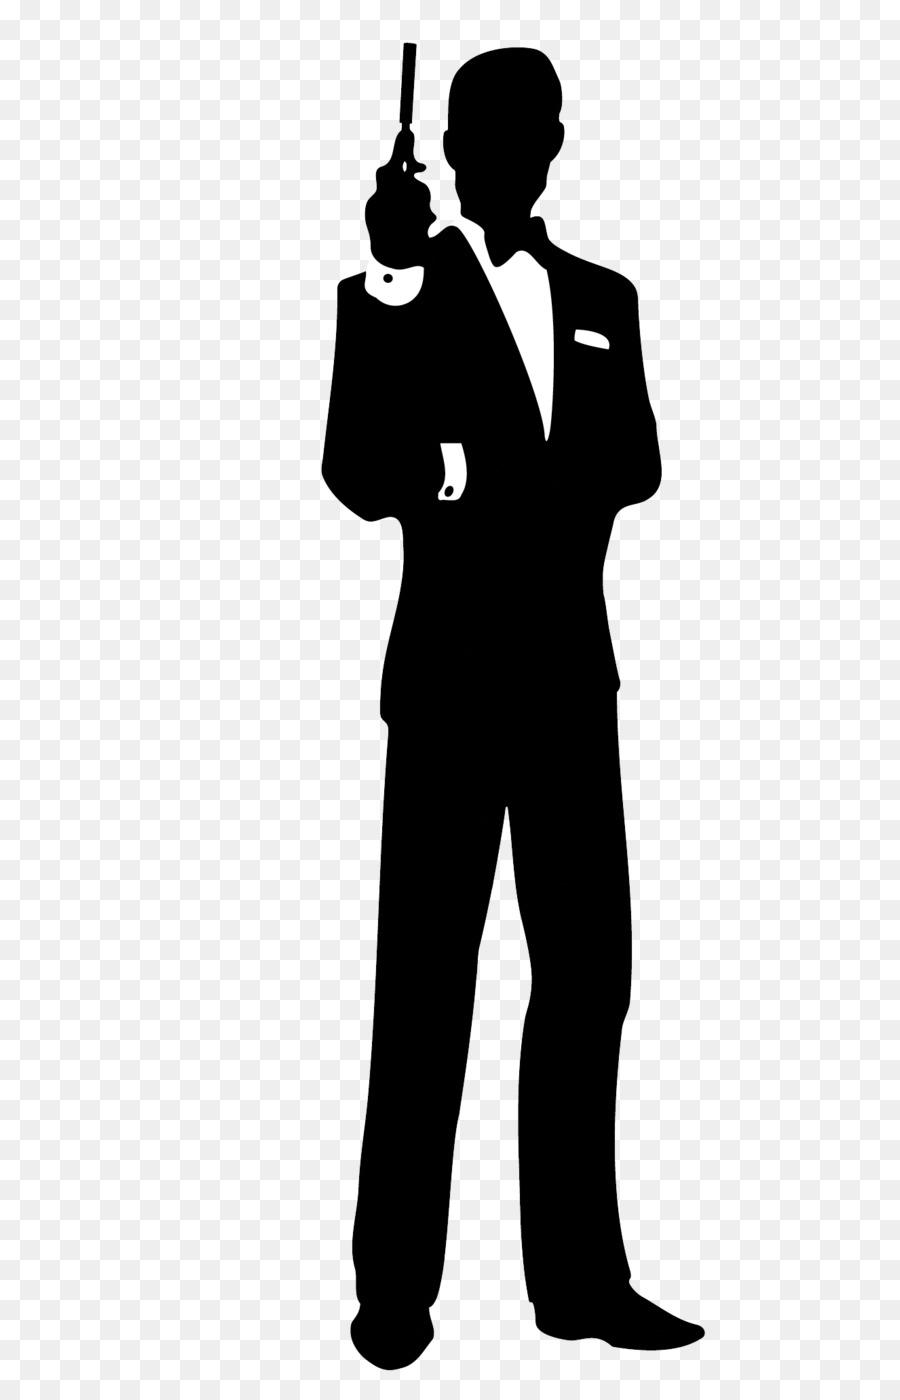 James Bond Film Series Silhouette Clip A-James Bond Film Series Silhouette Clip art - james bond-16